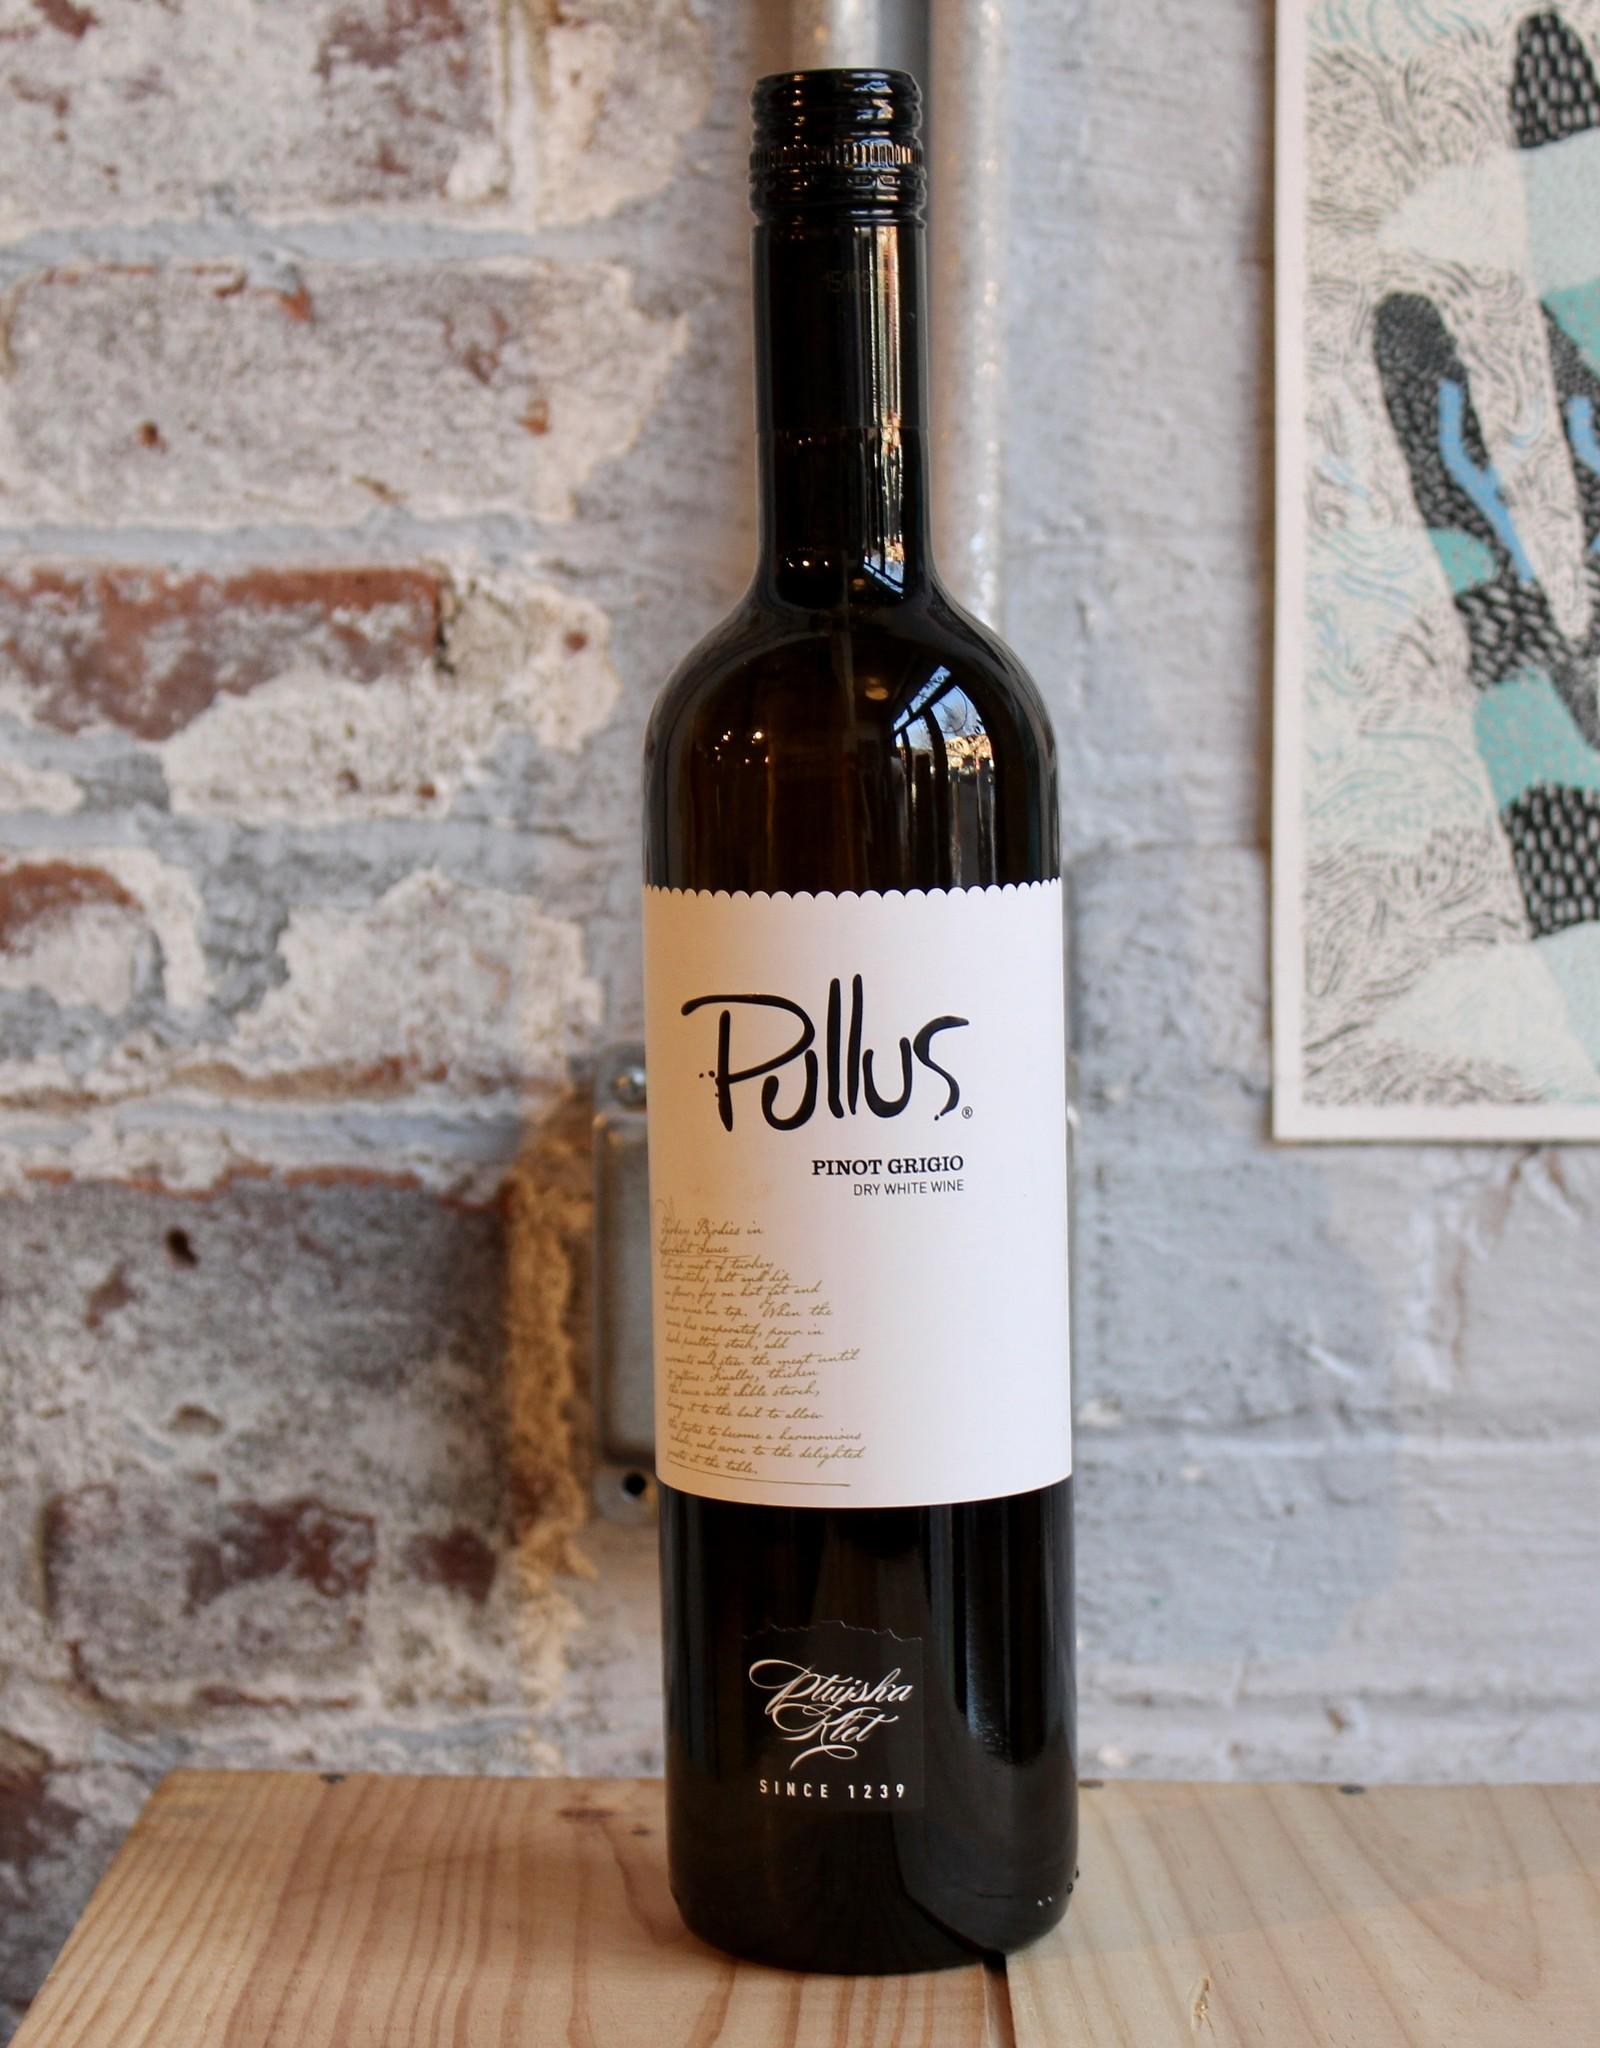 Wine 2019 Ptujska Klet Pullus Pinot Grigio - Podravje, Slovenia (750ml)